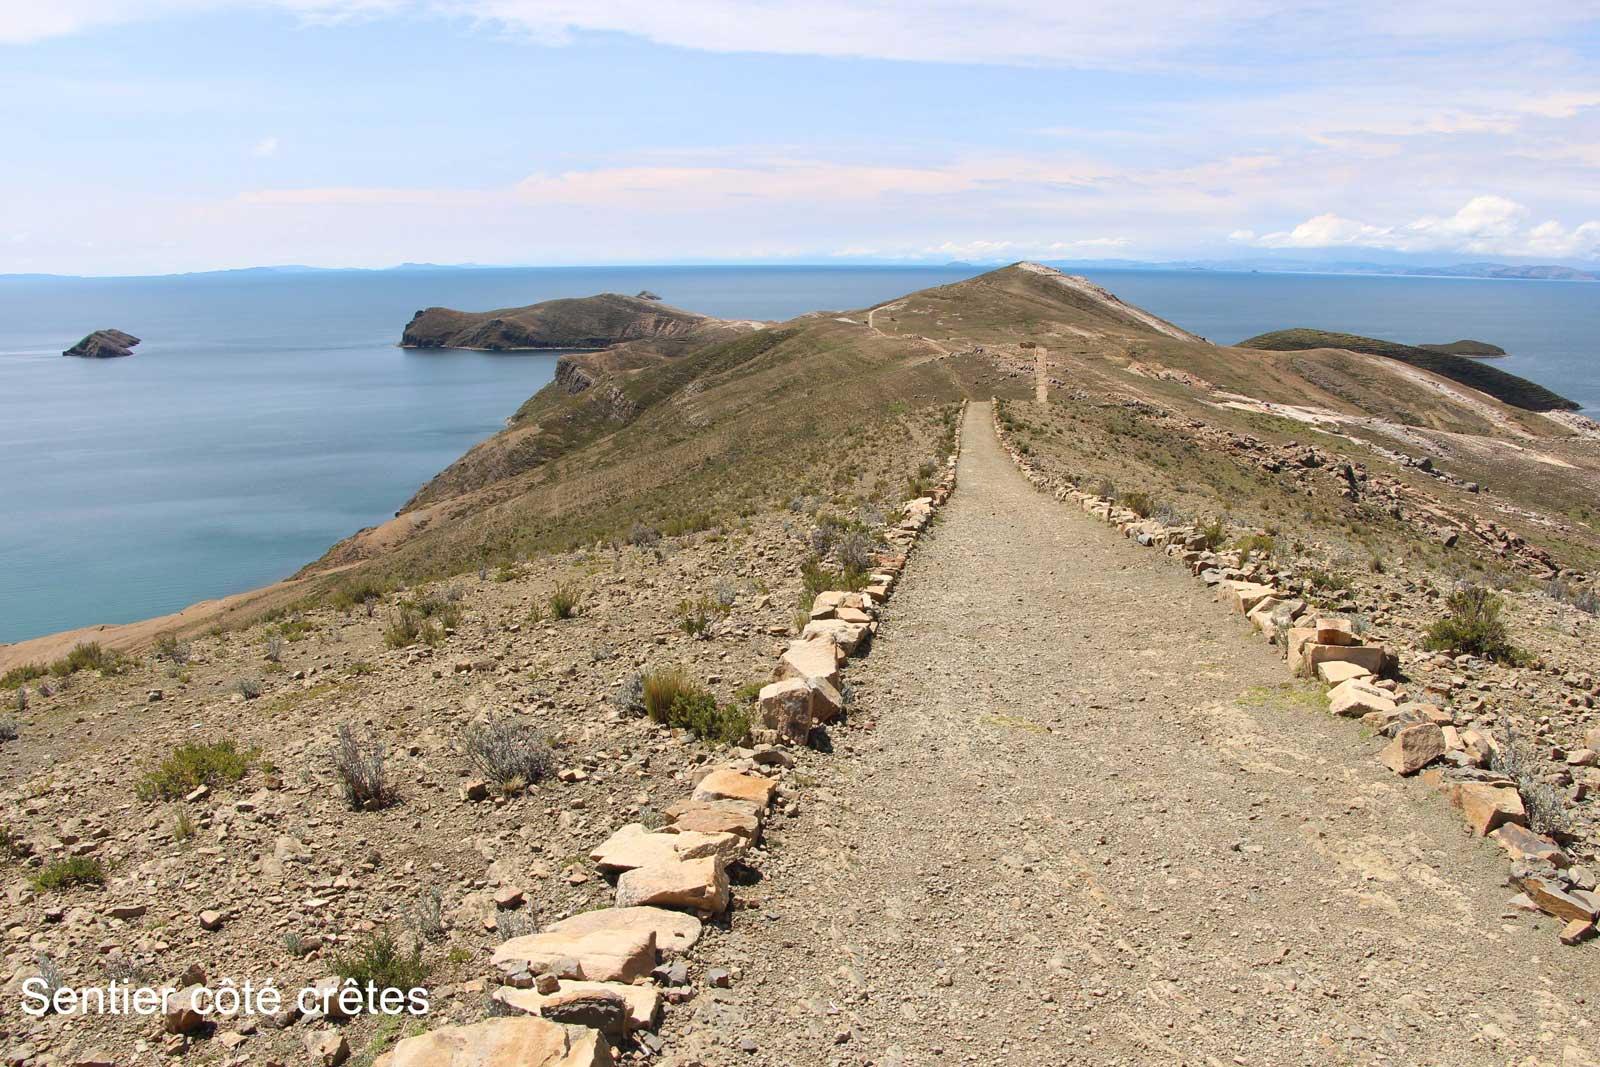 Isla del sol - Chemin des crêtes